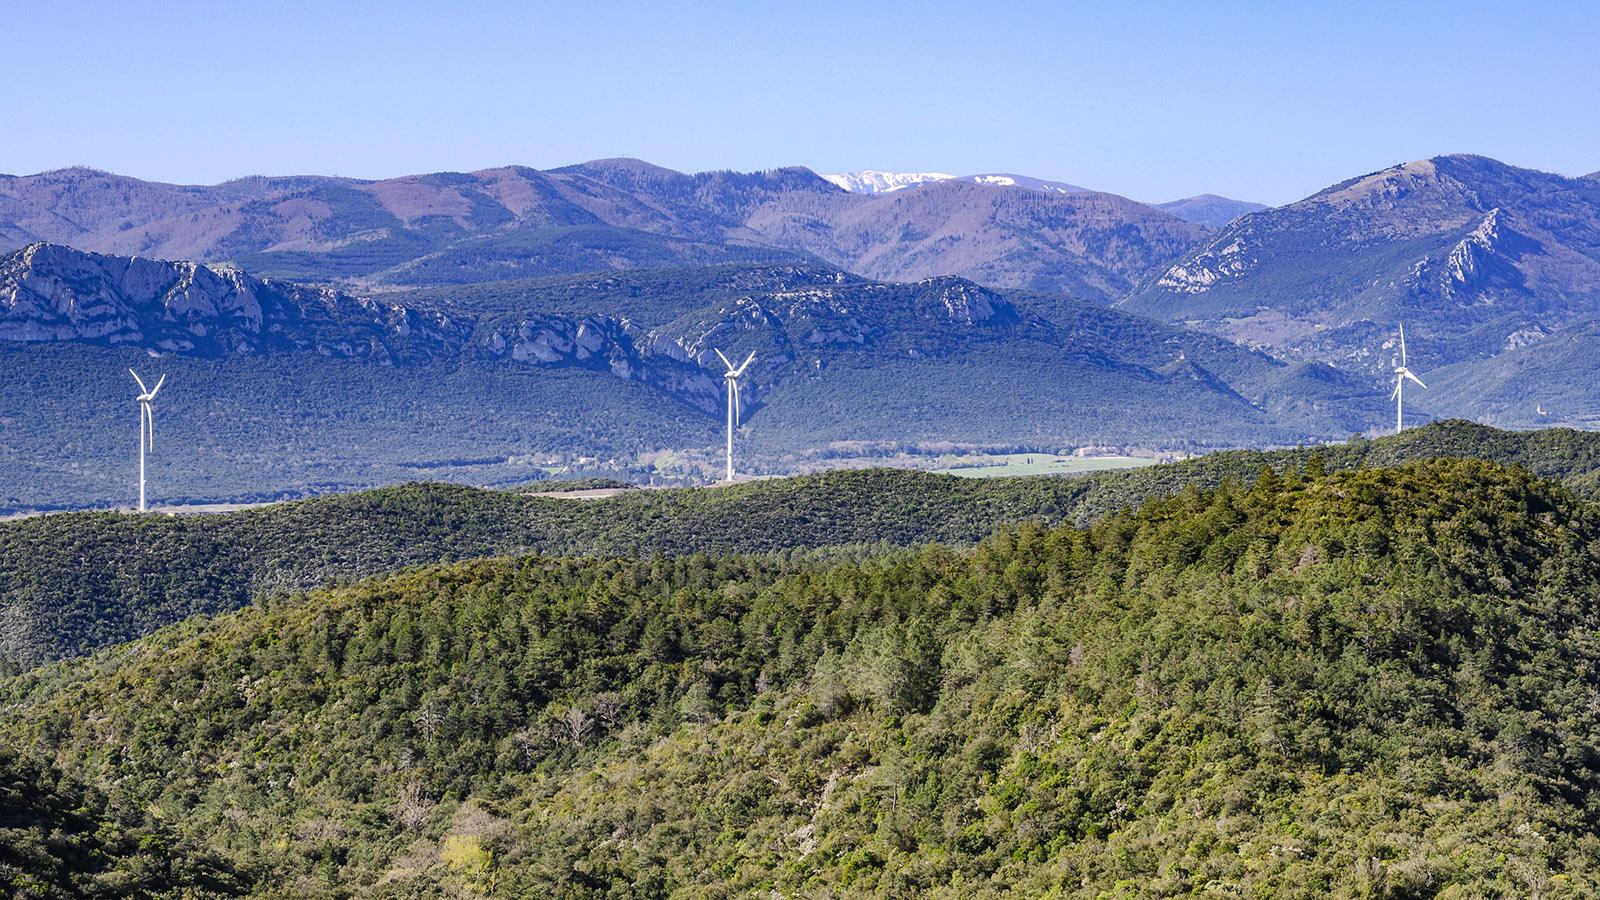 Der Blick über das Tal der Boulzane hin zum Pic des Madrès. Foto: Hilke Maunder